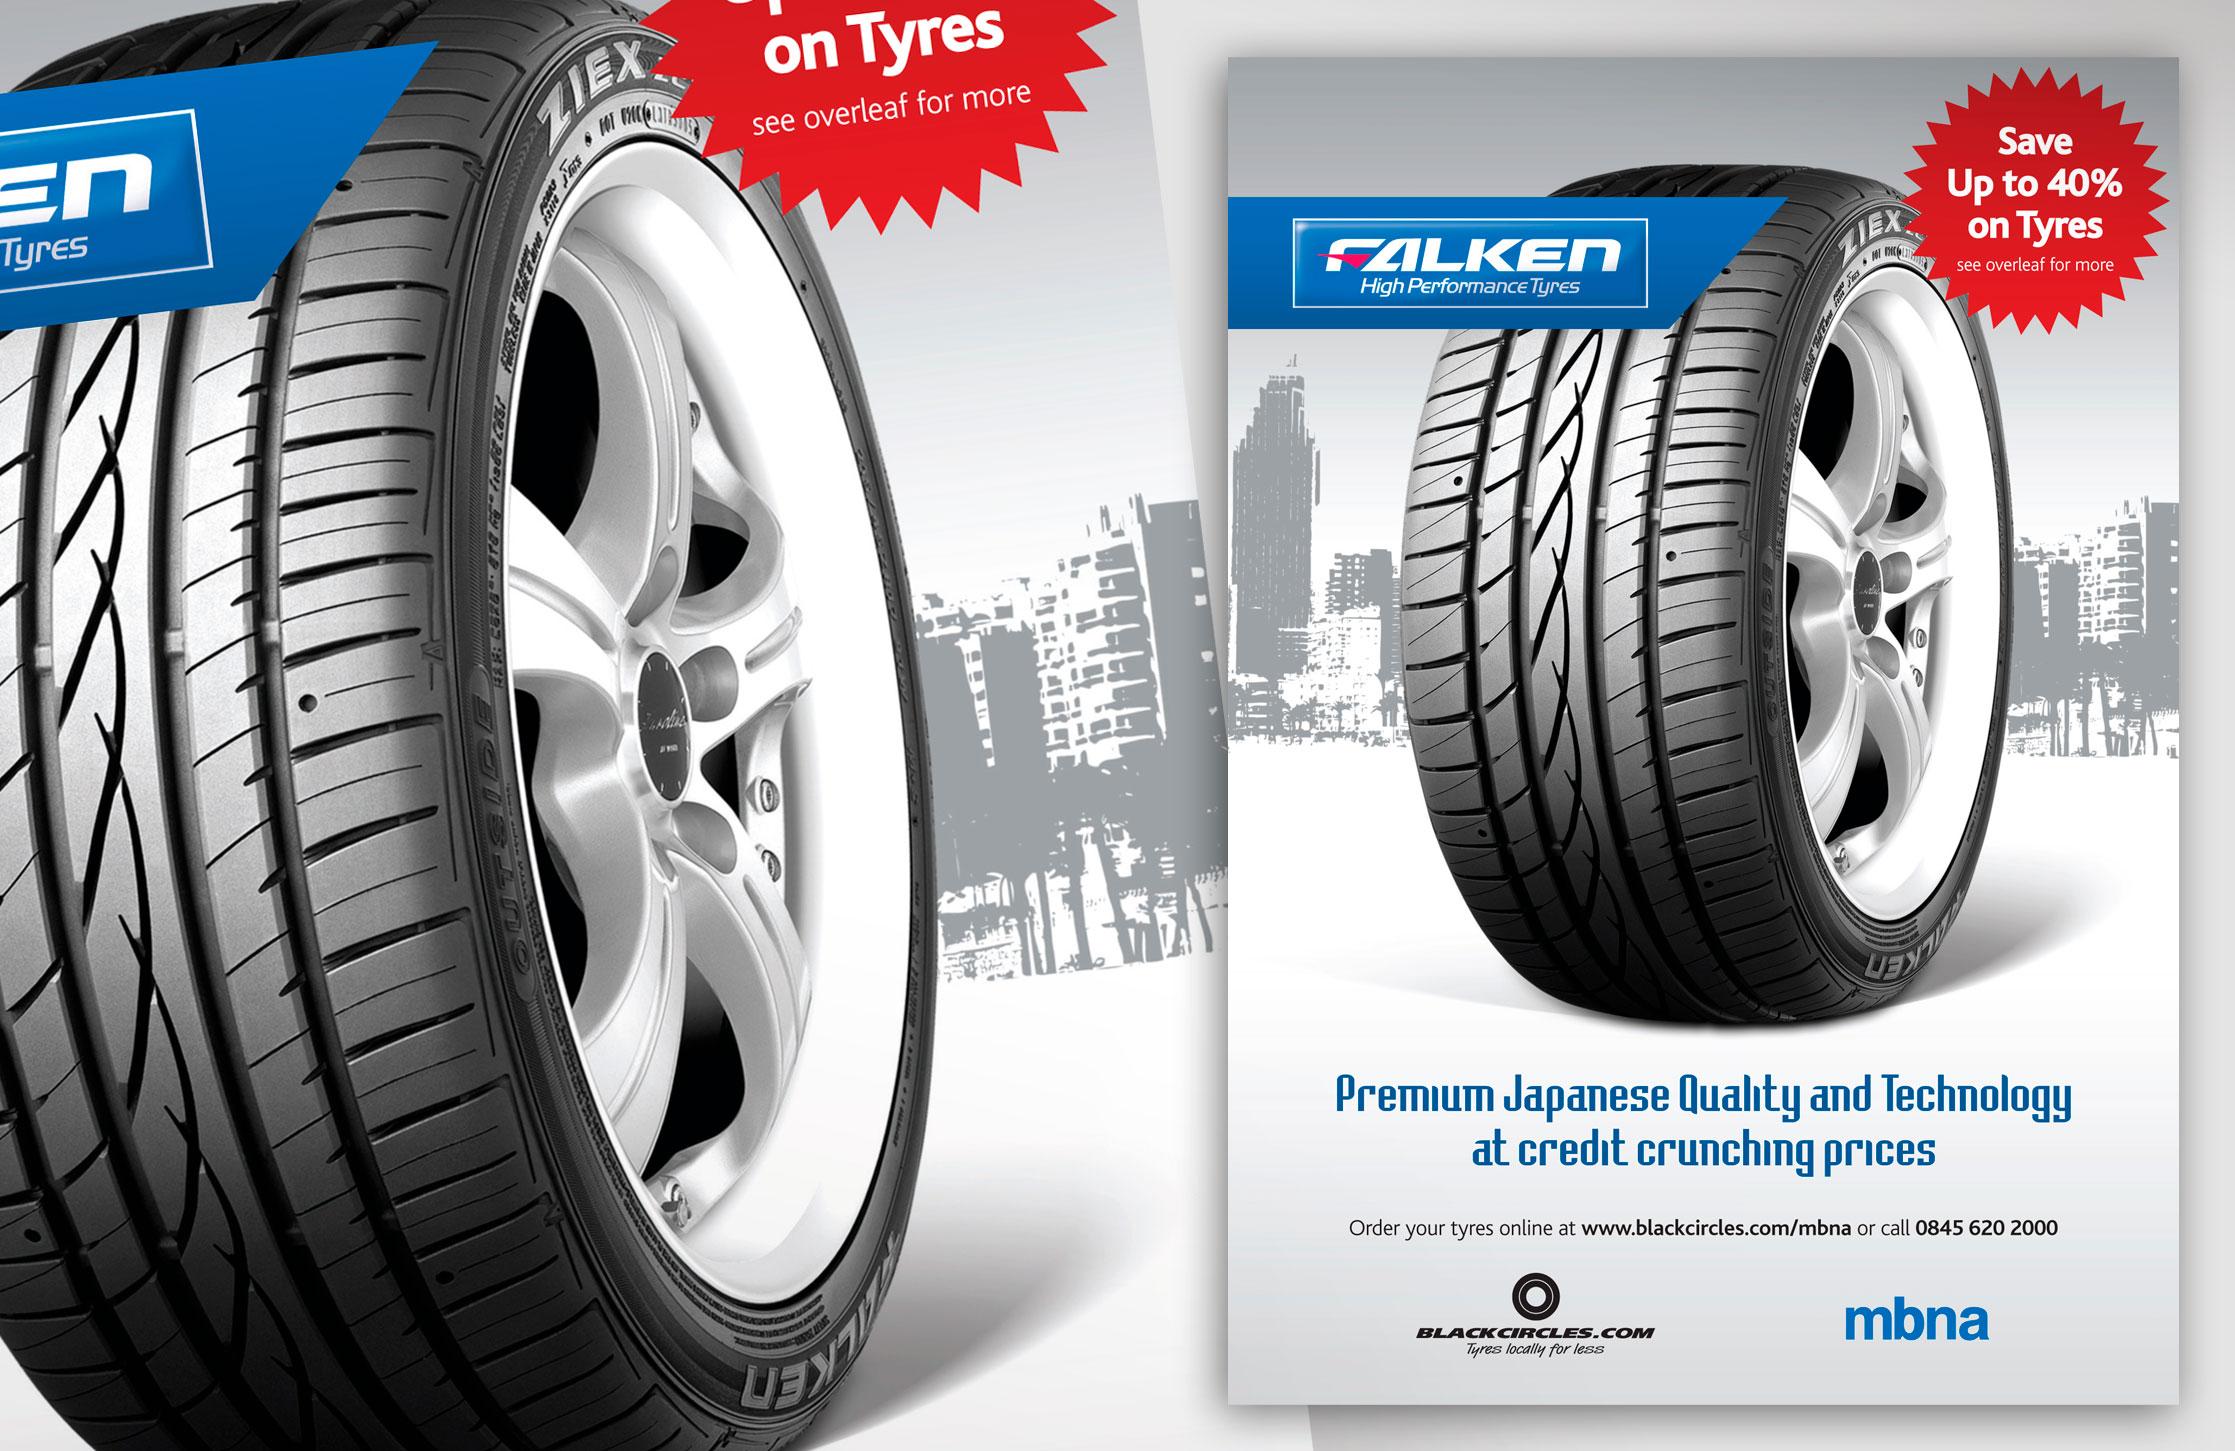 Falken High Performance tyres